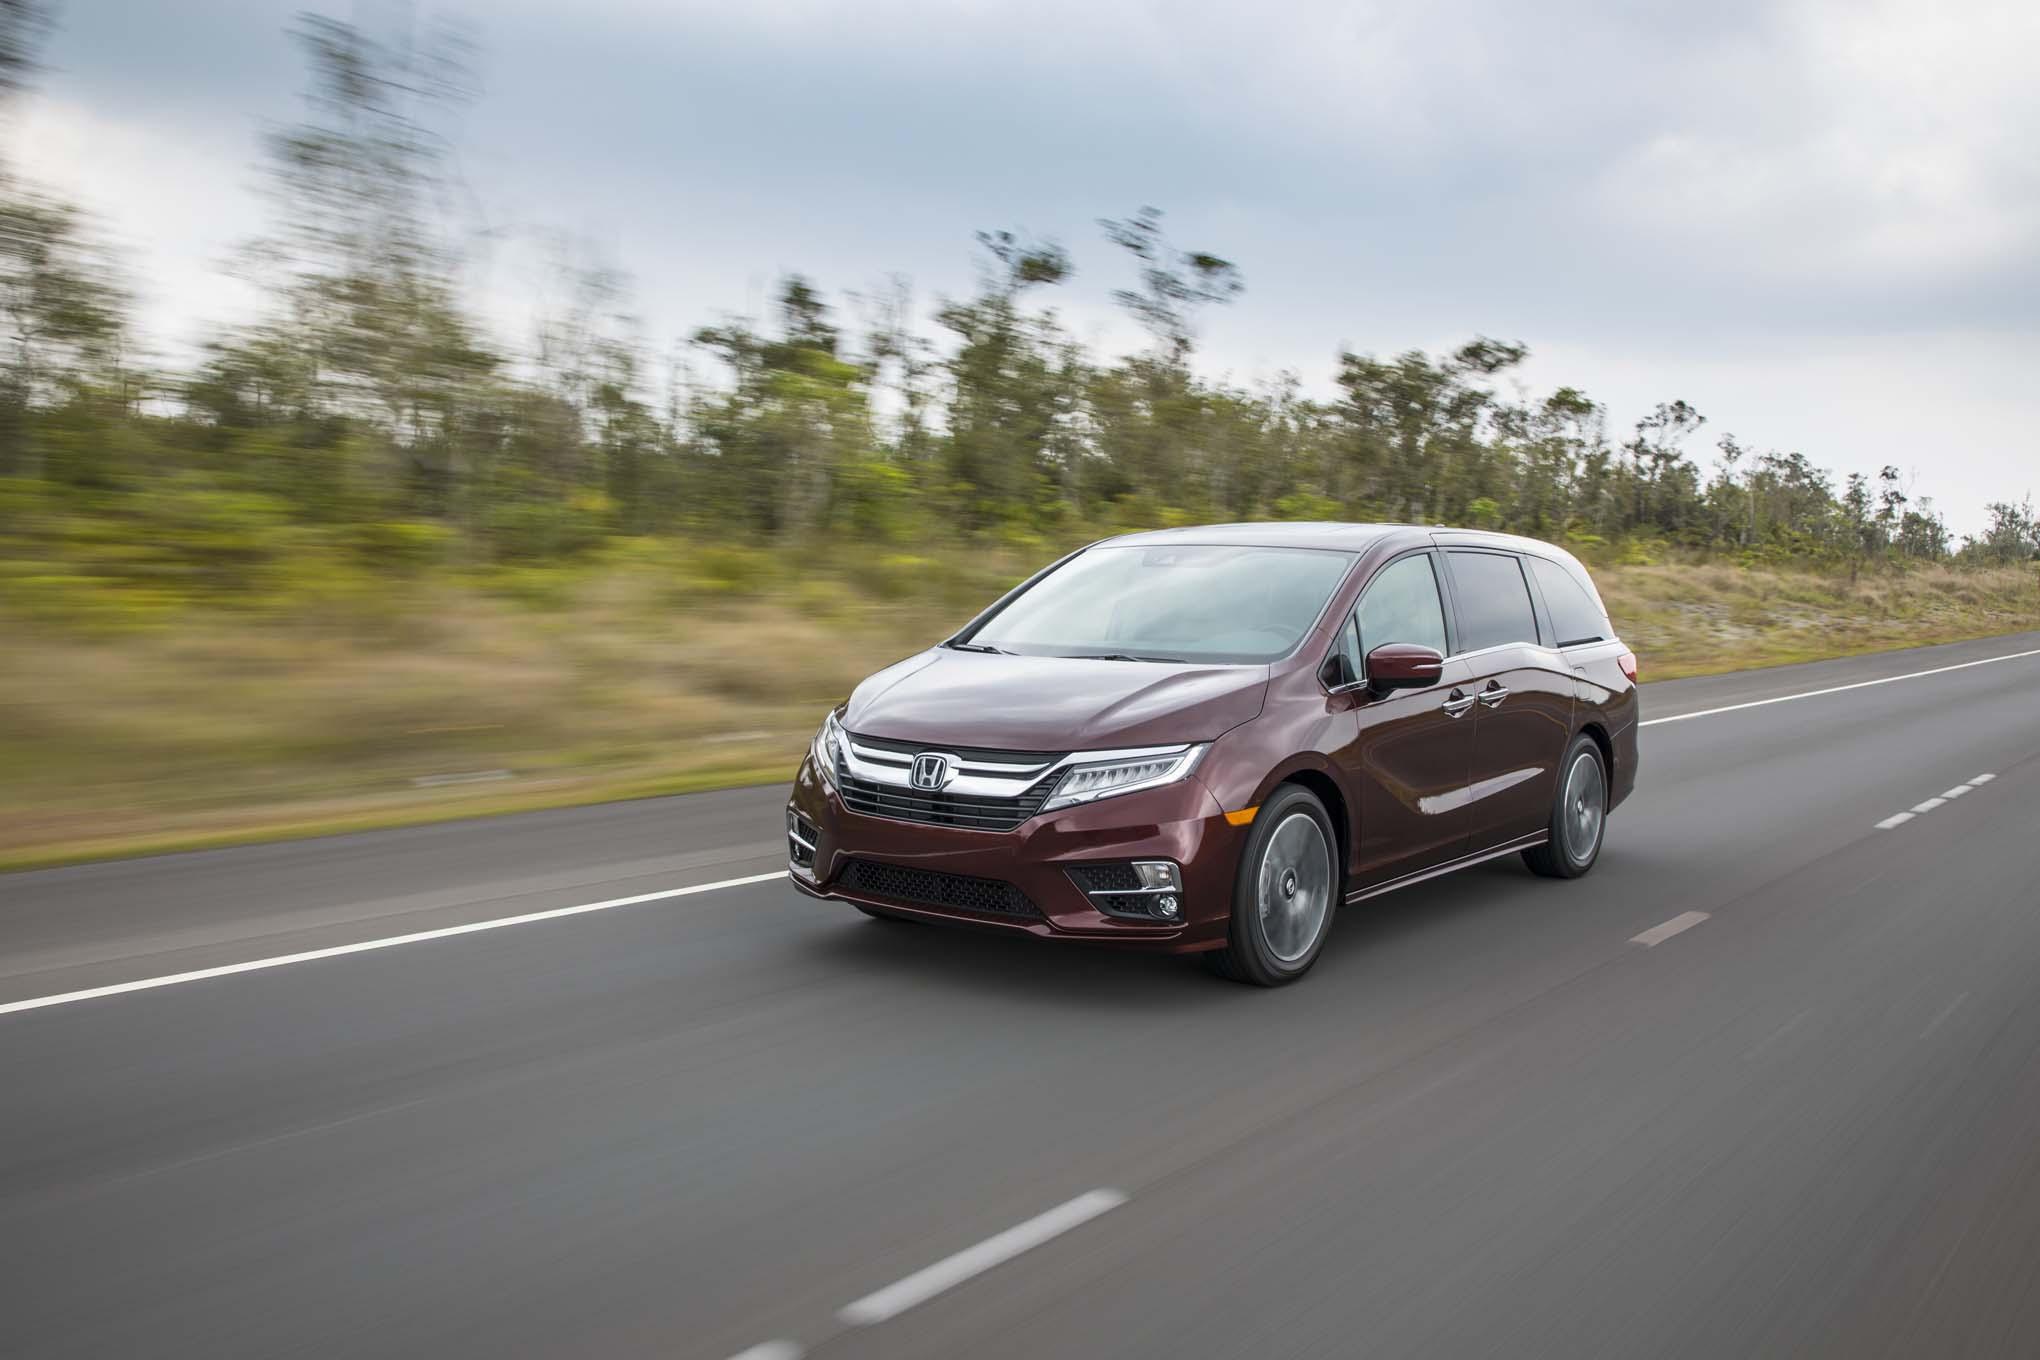 2018 Honda Odyssey Front Three Quarter In Motion 09